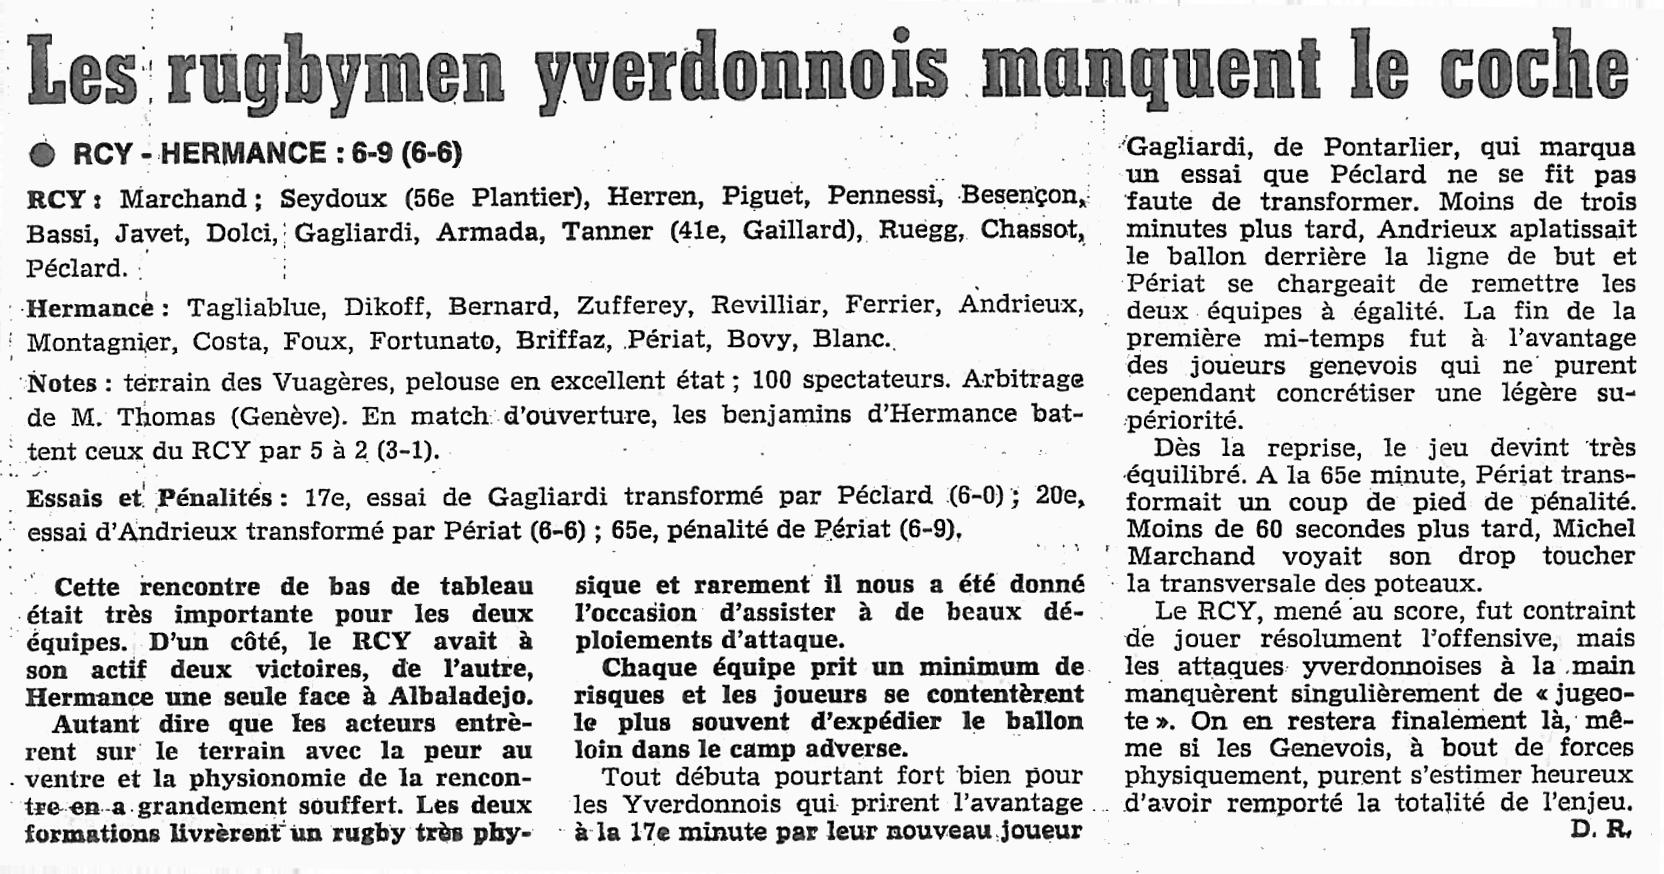 1980.11.08 RCY - RC HERMANCE